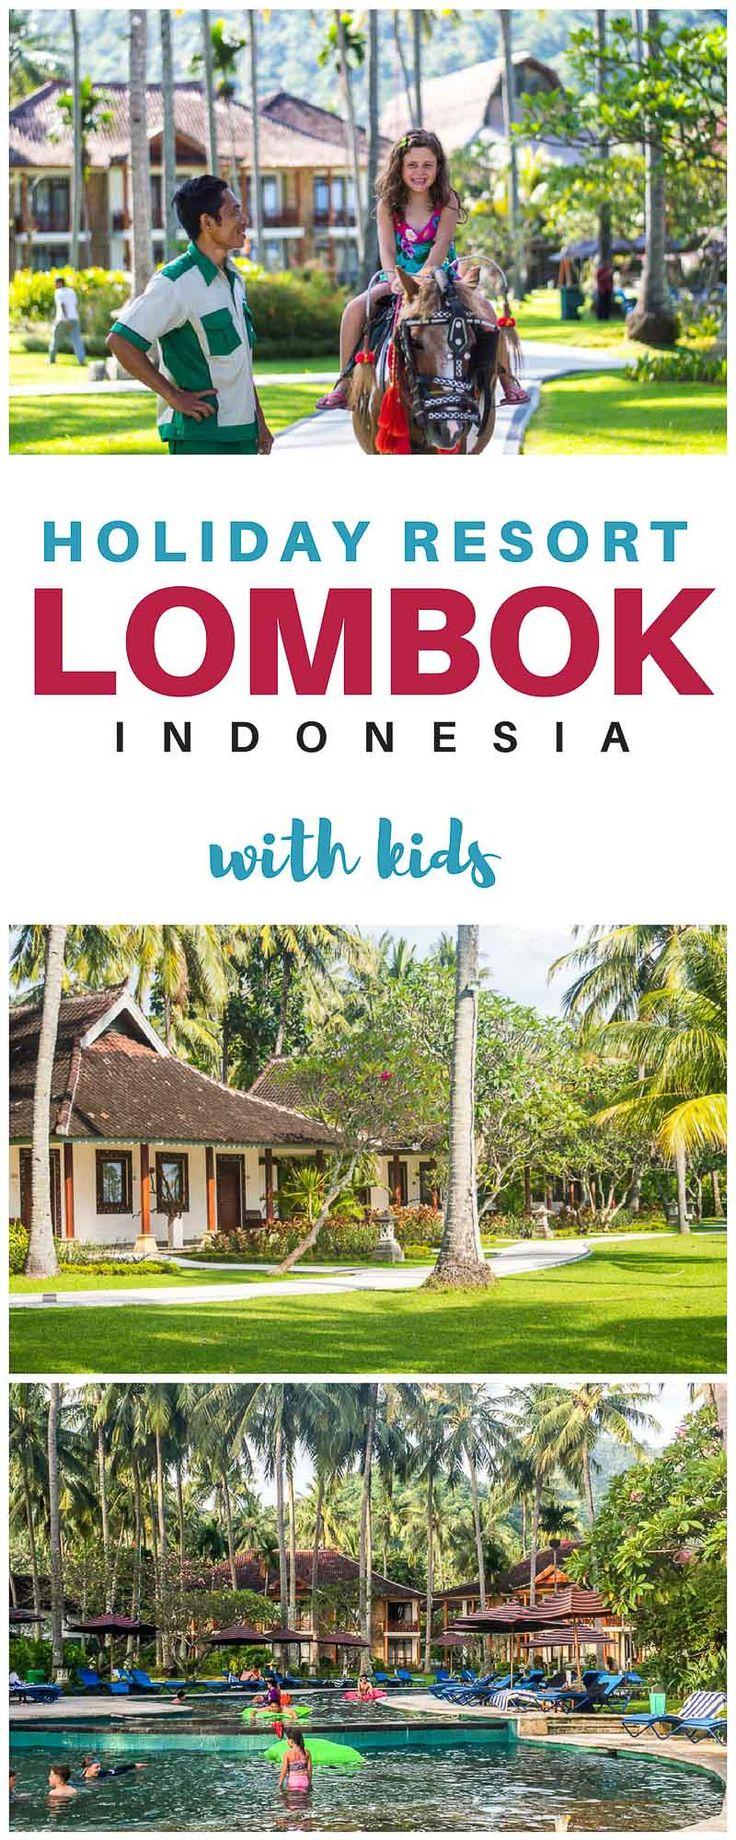 Lombok Indonesia | Lombok Senggigi | Lombok Hotel | Lombok Accommodation | Lombok Resort | Lombok with Kids | Lombok Holiday Resort